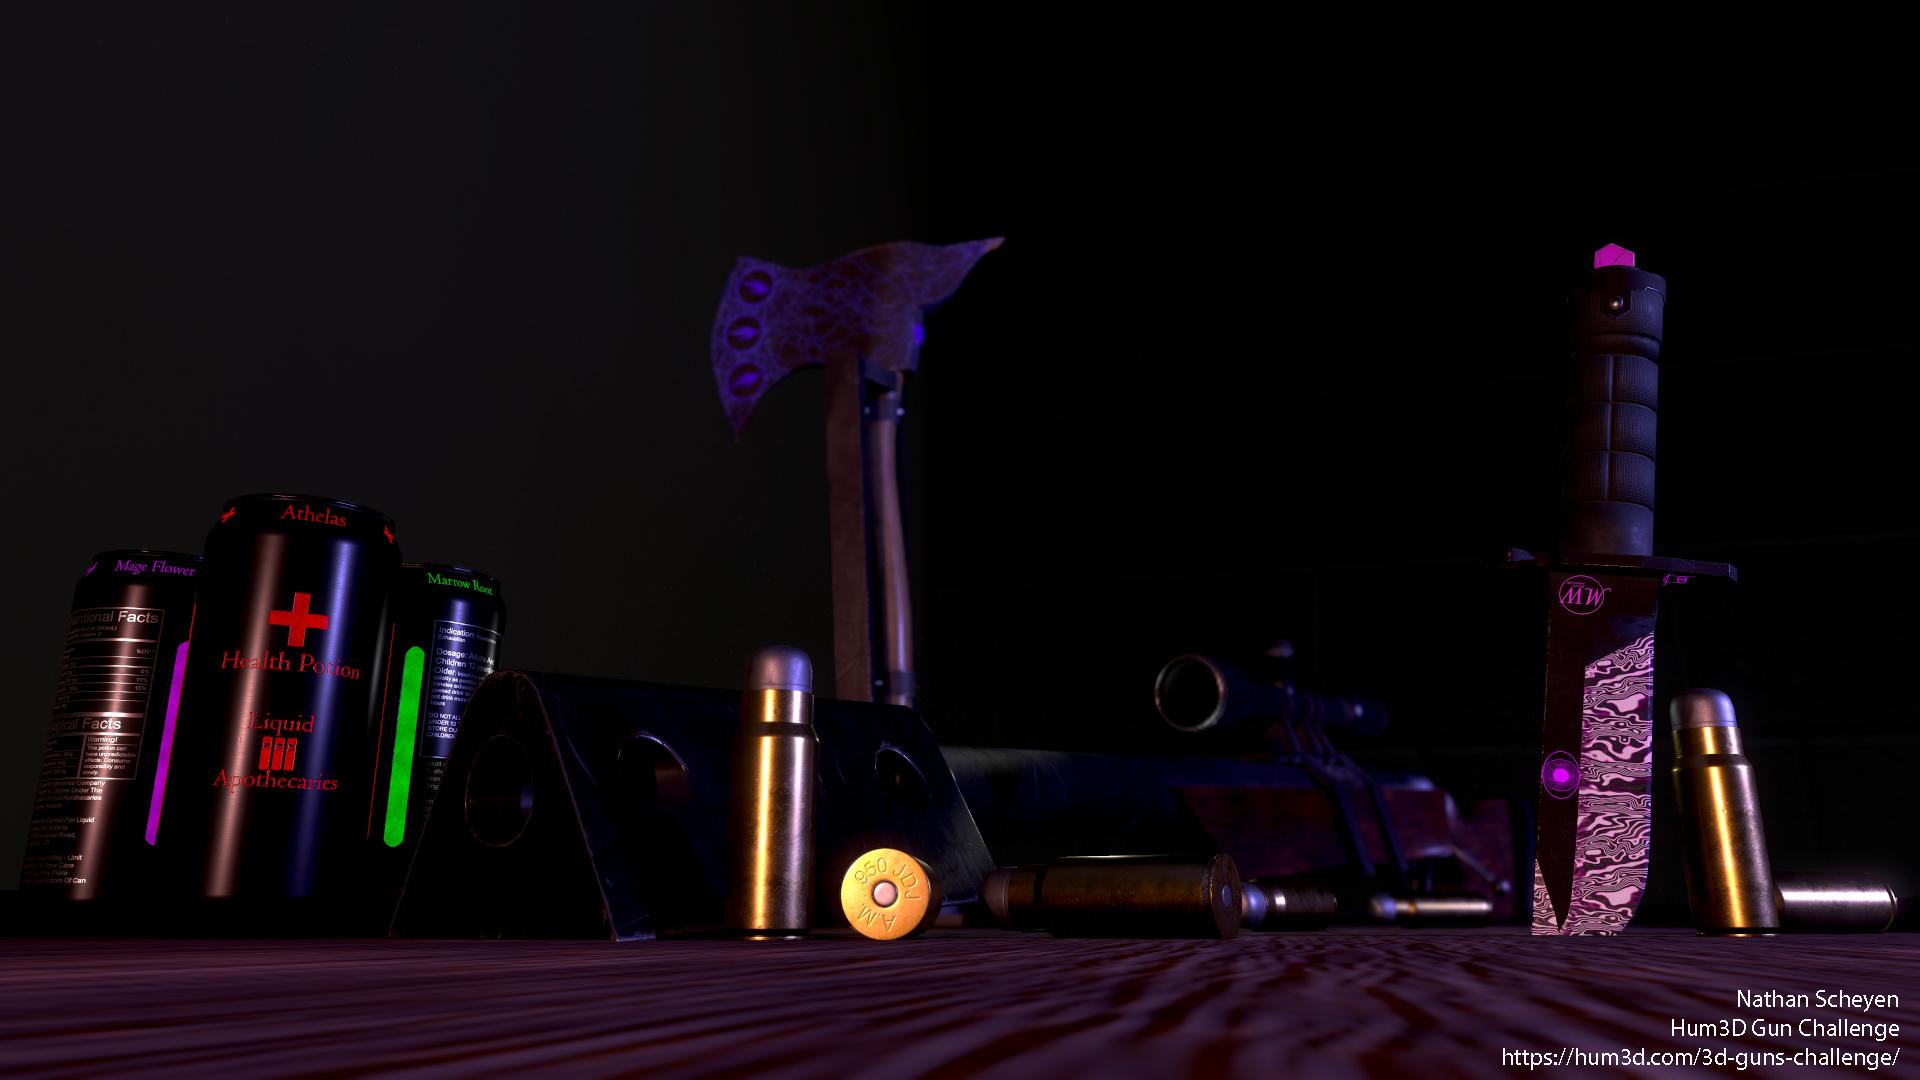 Exterminator's Kit 3d art